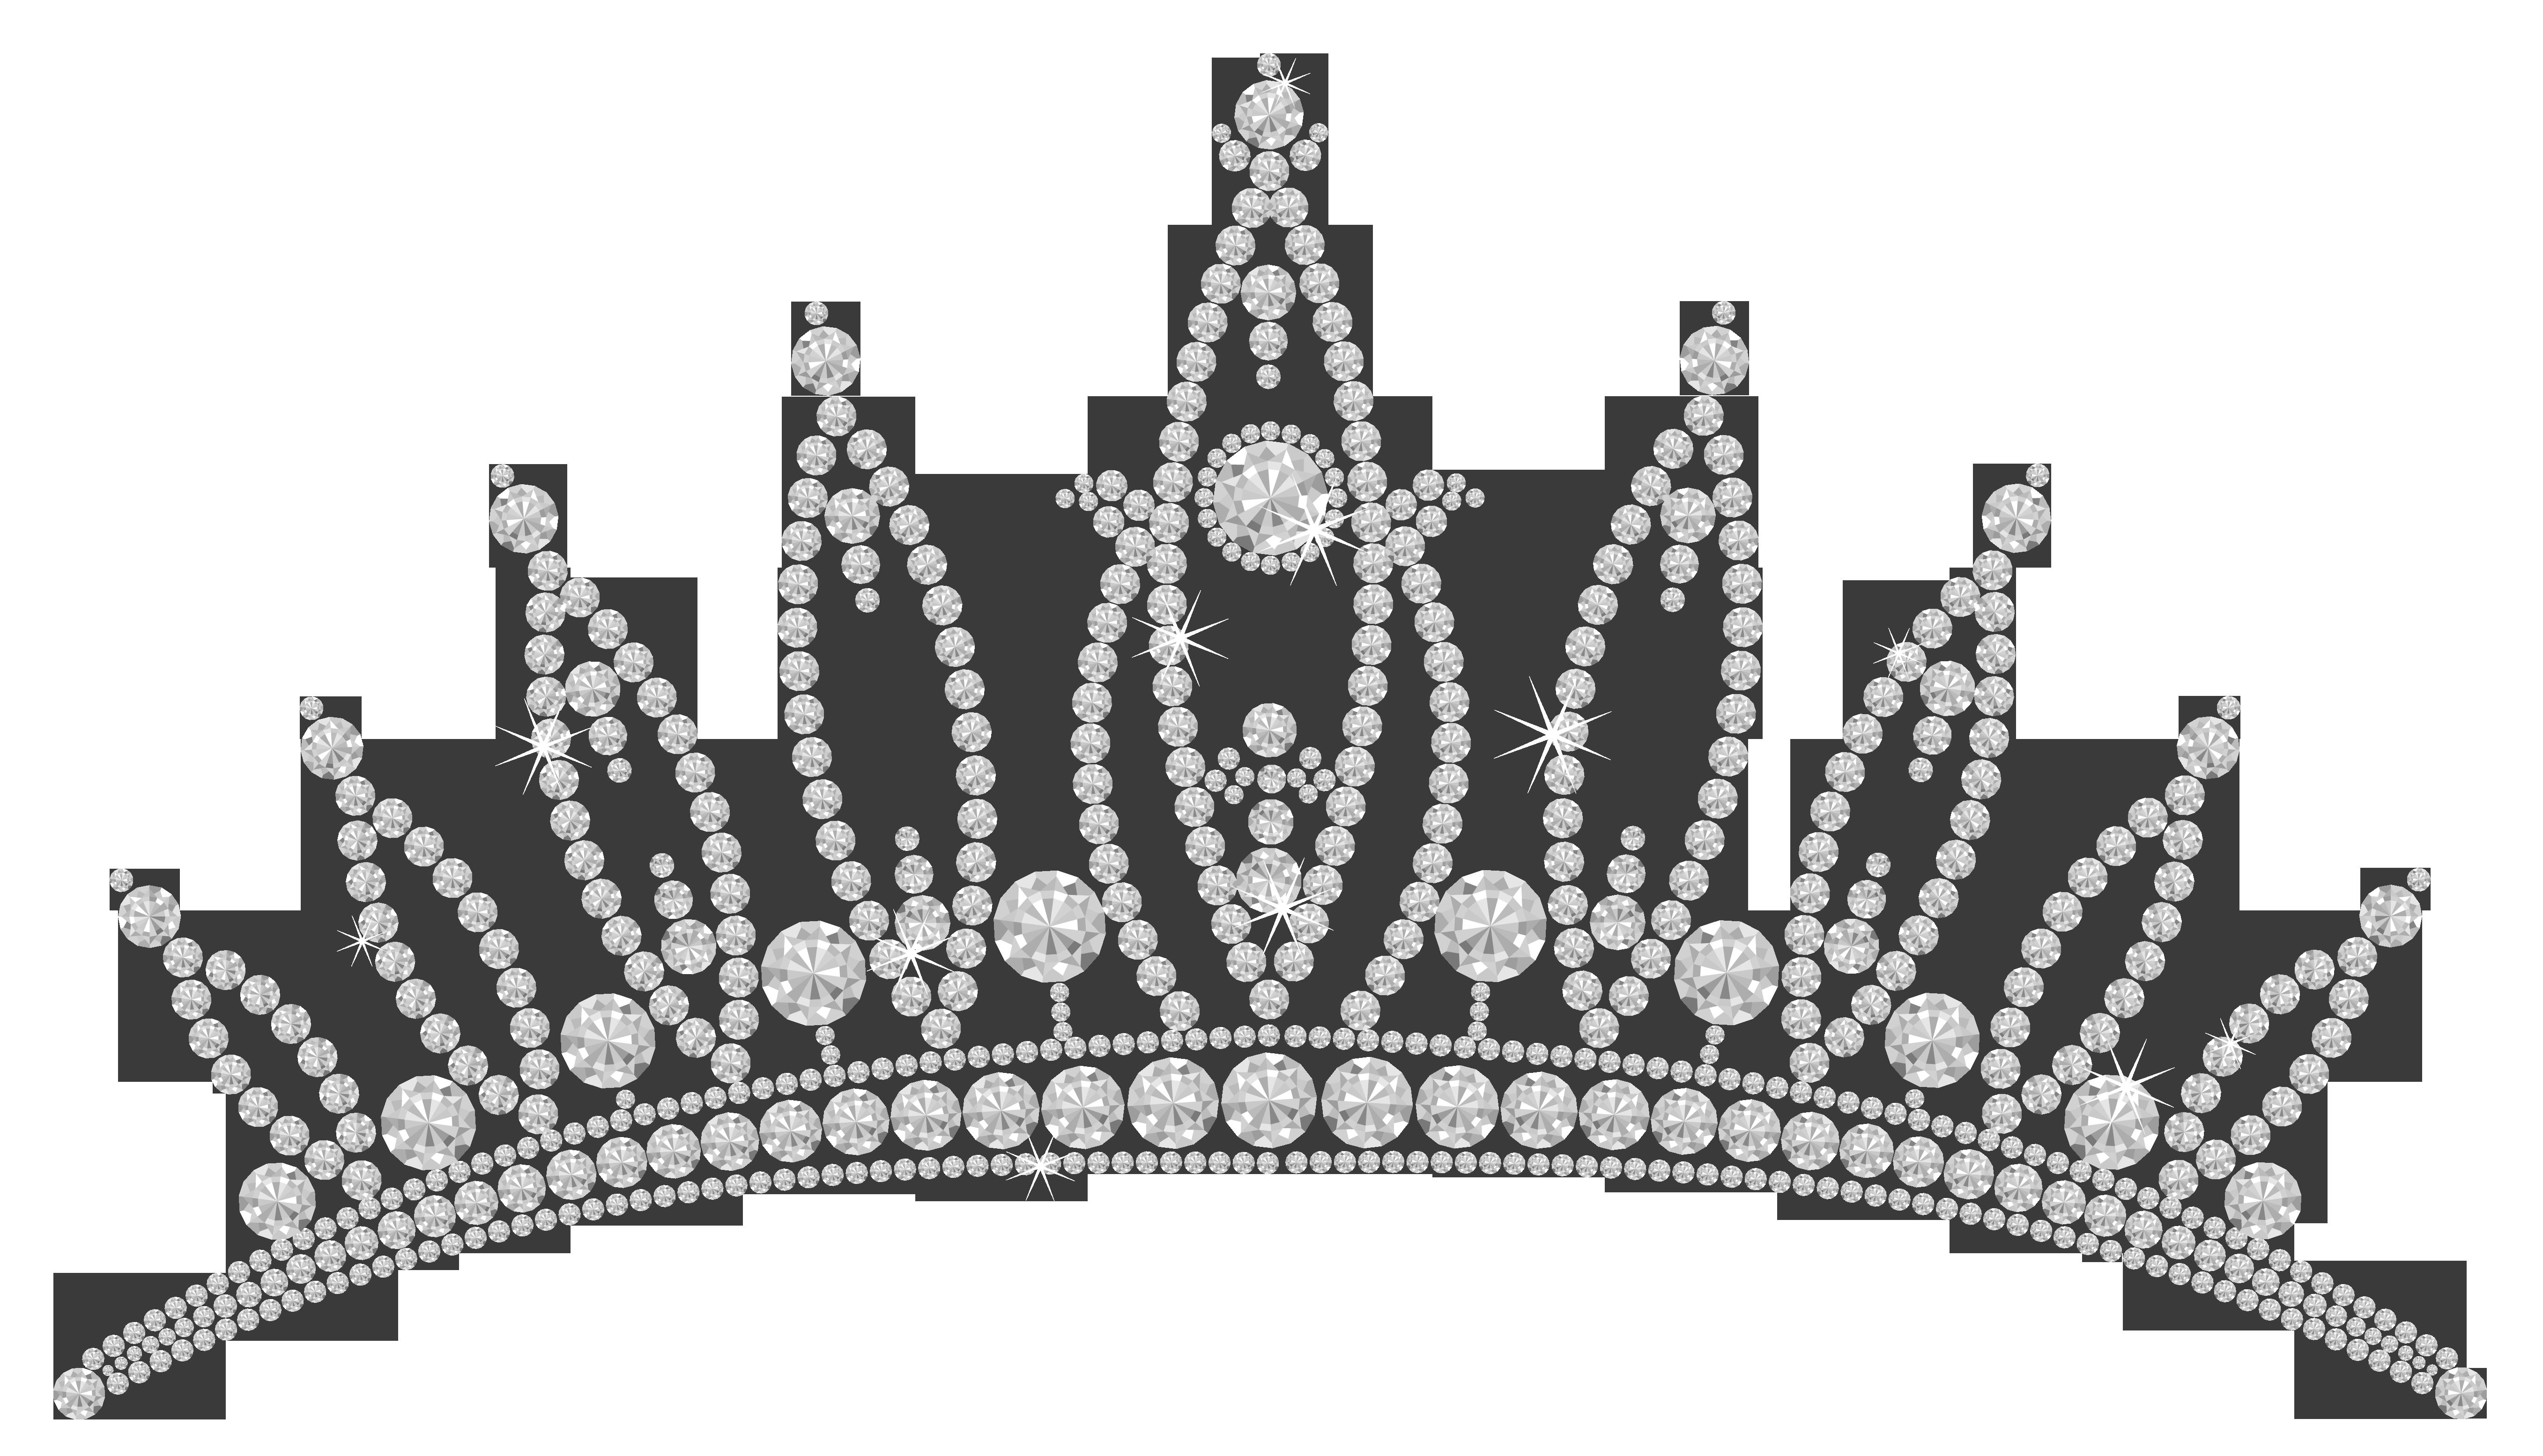 clipart transparent download Crown clip art diamond. Transparent tiara